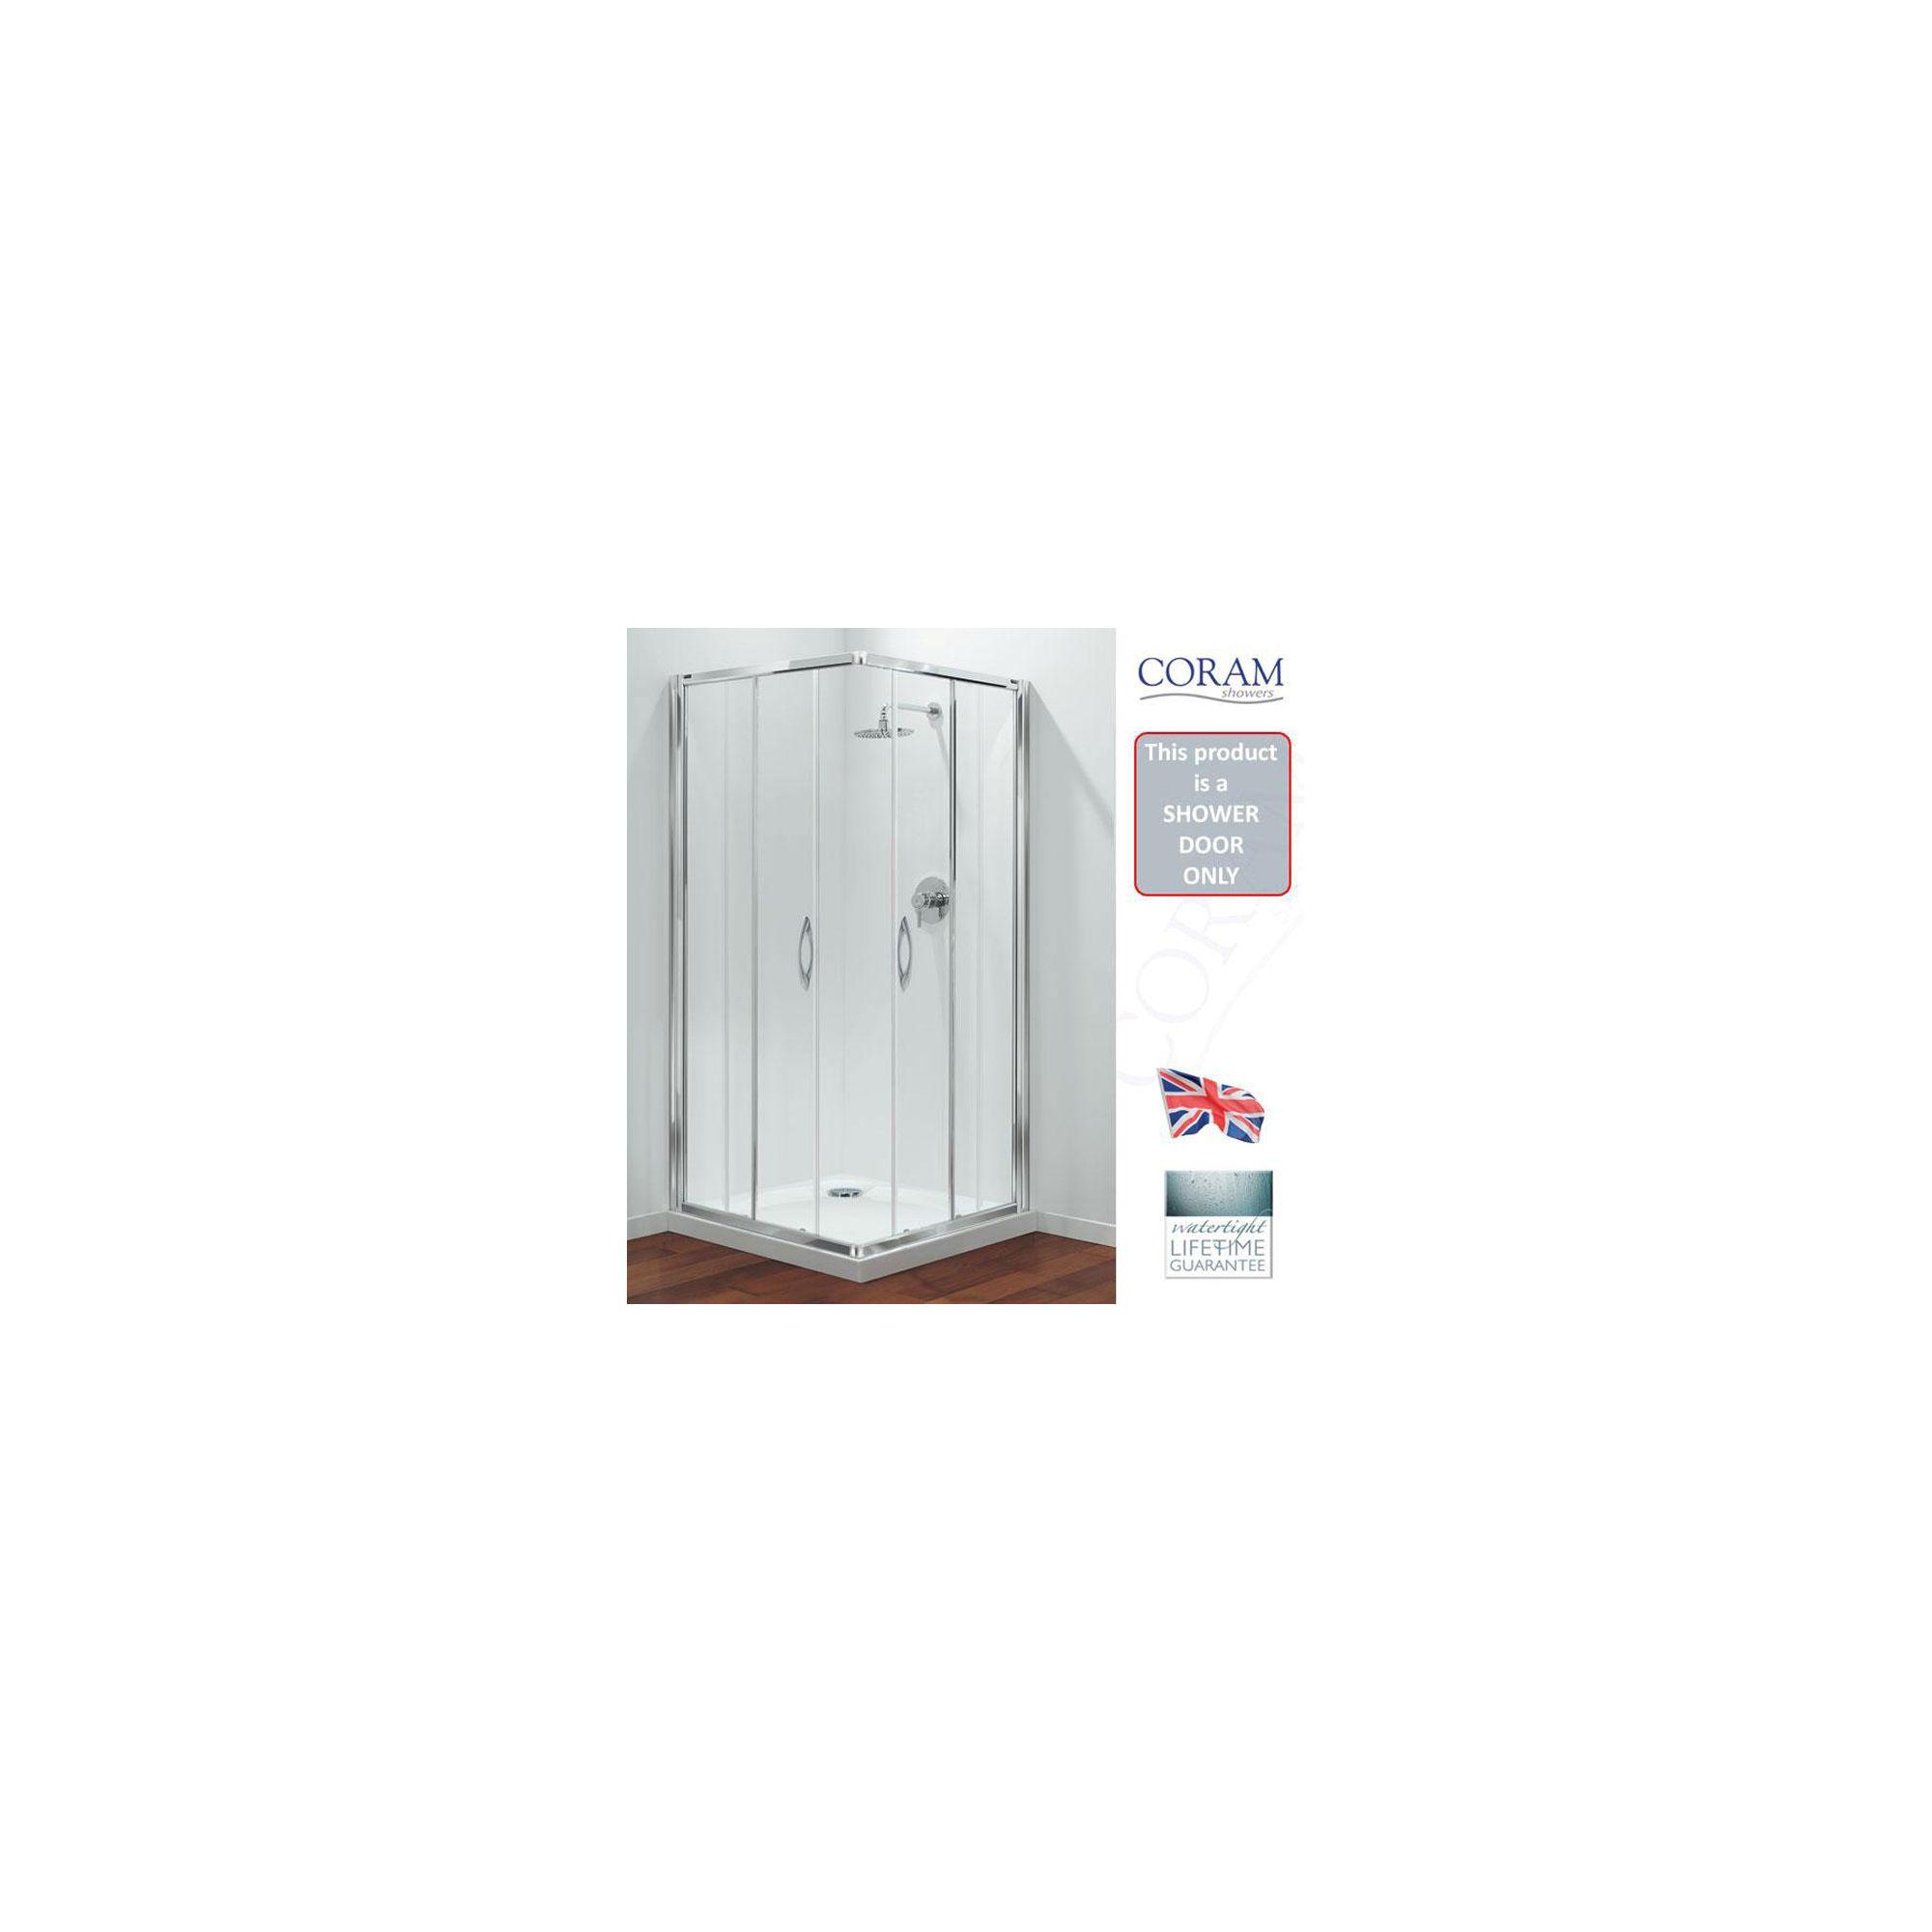 Coram Premier Corner Entry Frame and Door Pack Only 900mm at Tesco Direct